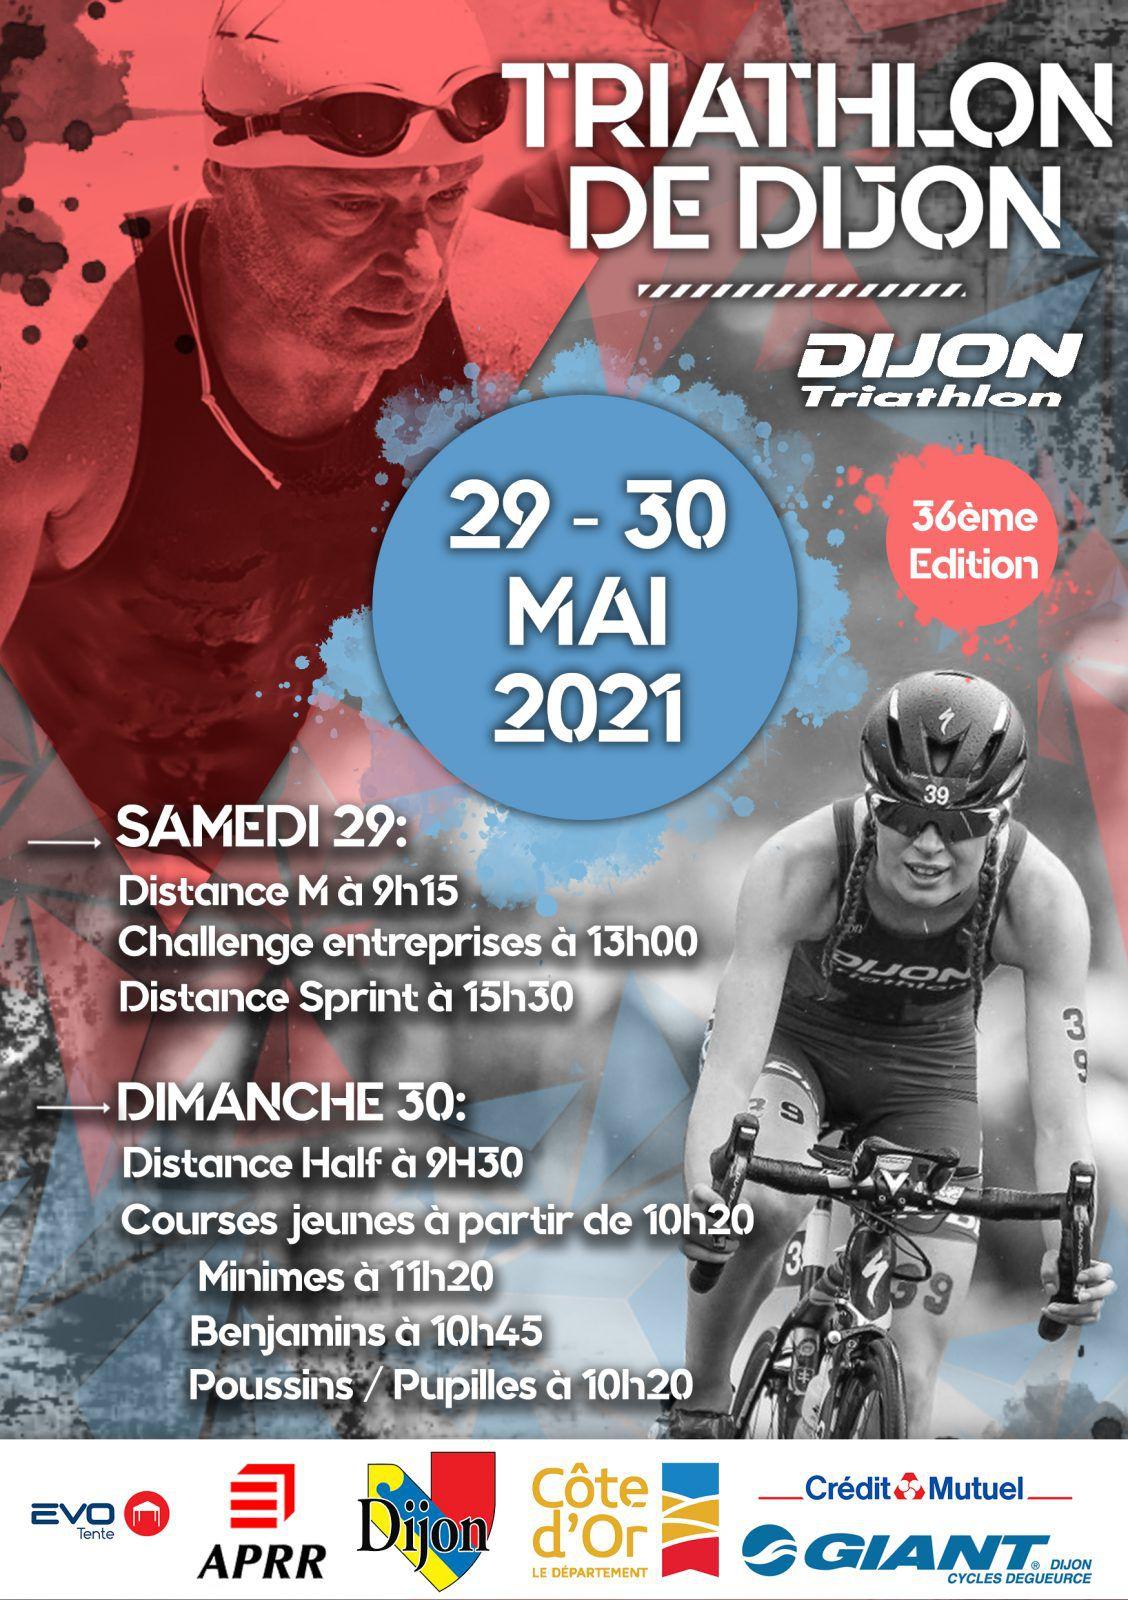 TRIATHLON DE DIJON 29 et 30 MAI 2021 36eme Edition